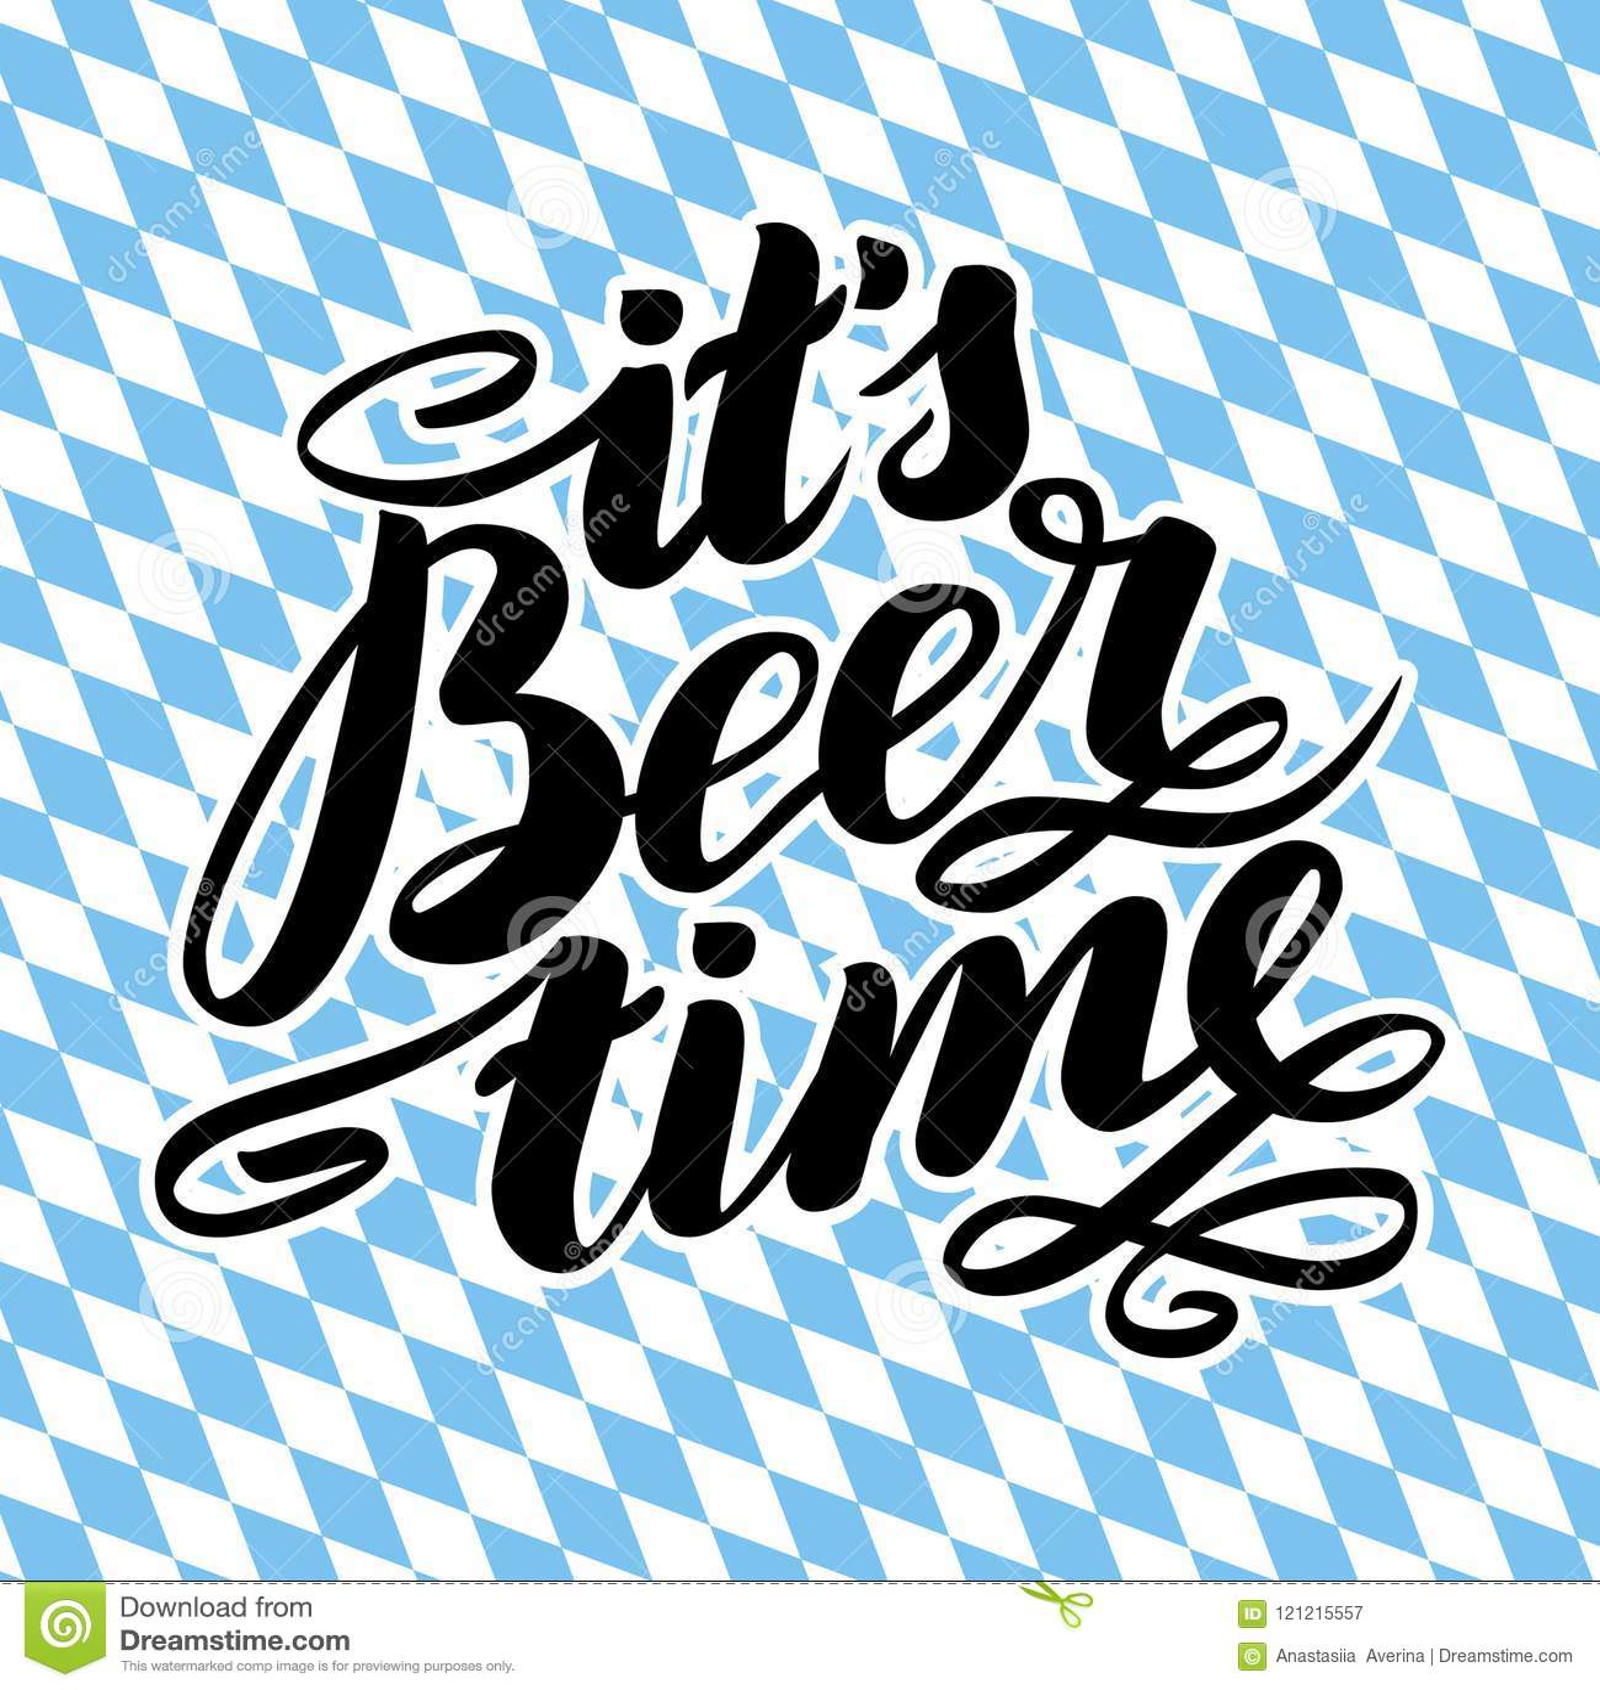 It S Beer Time  Traditional German Oktoberfest Bier Festival